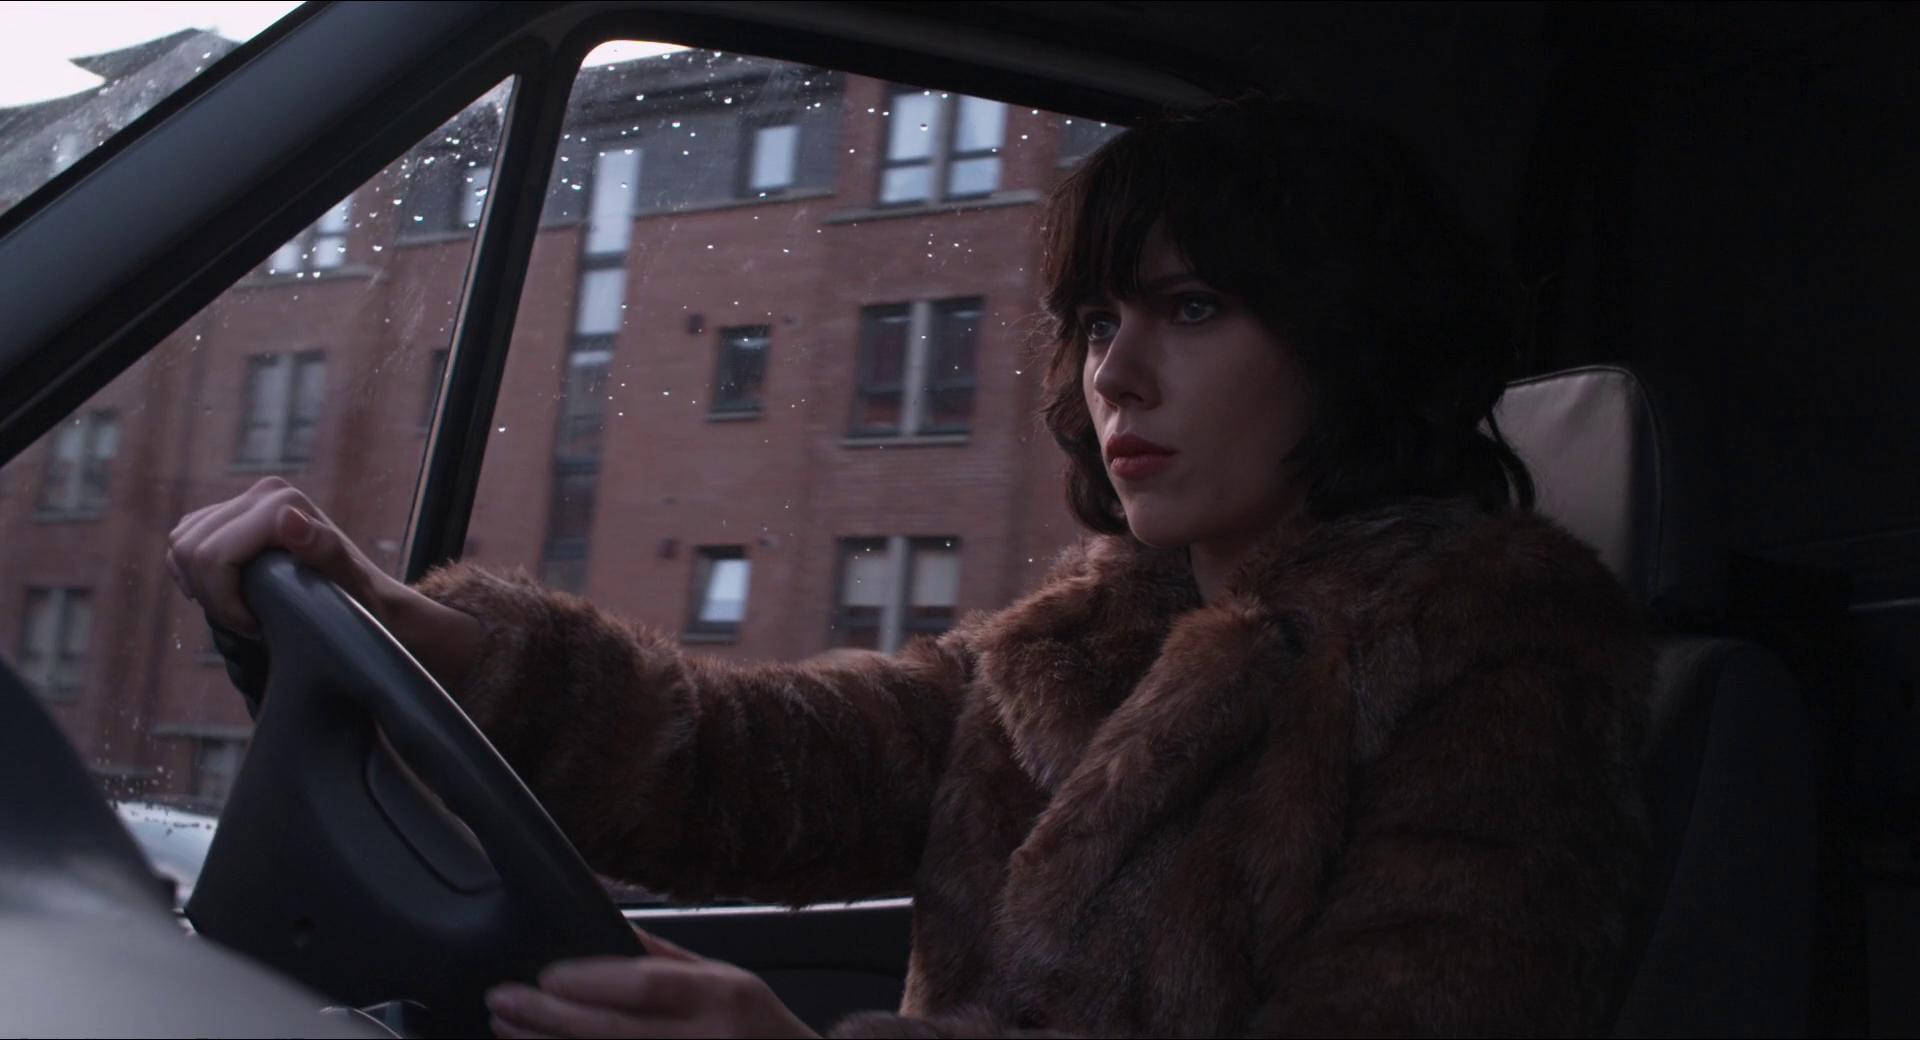 Побудь в моей шкуре Under the skin (2013)